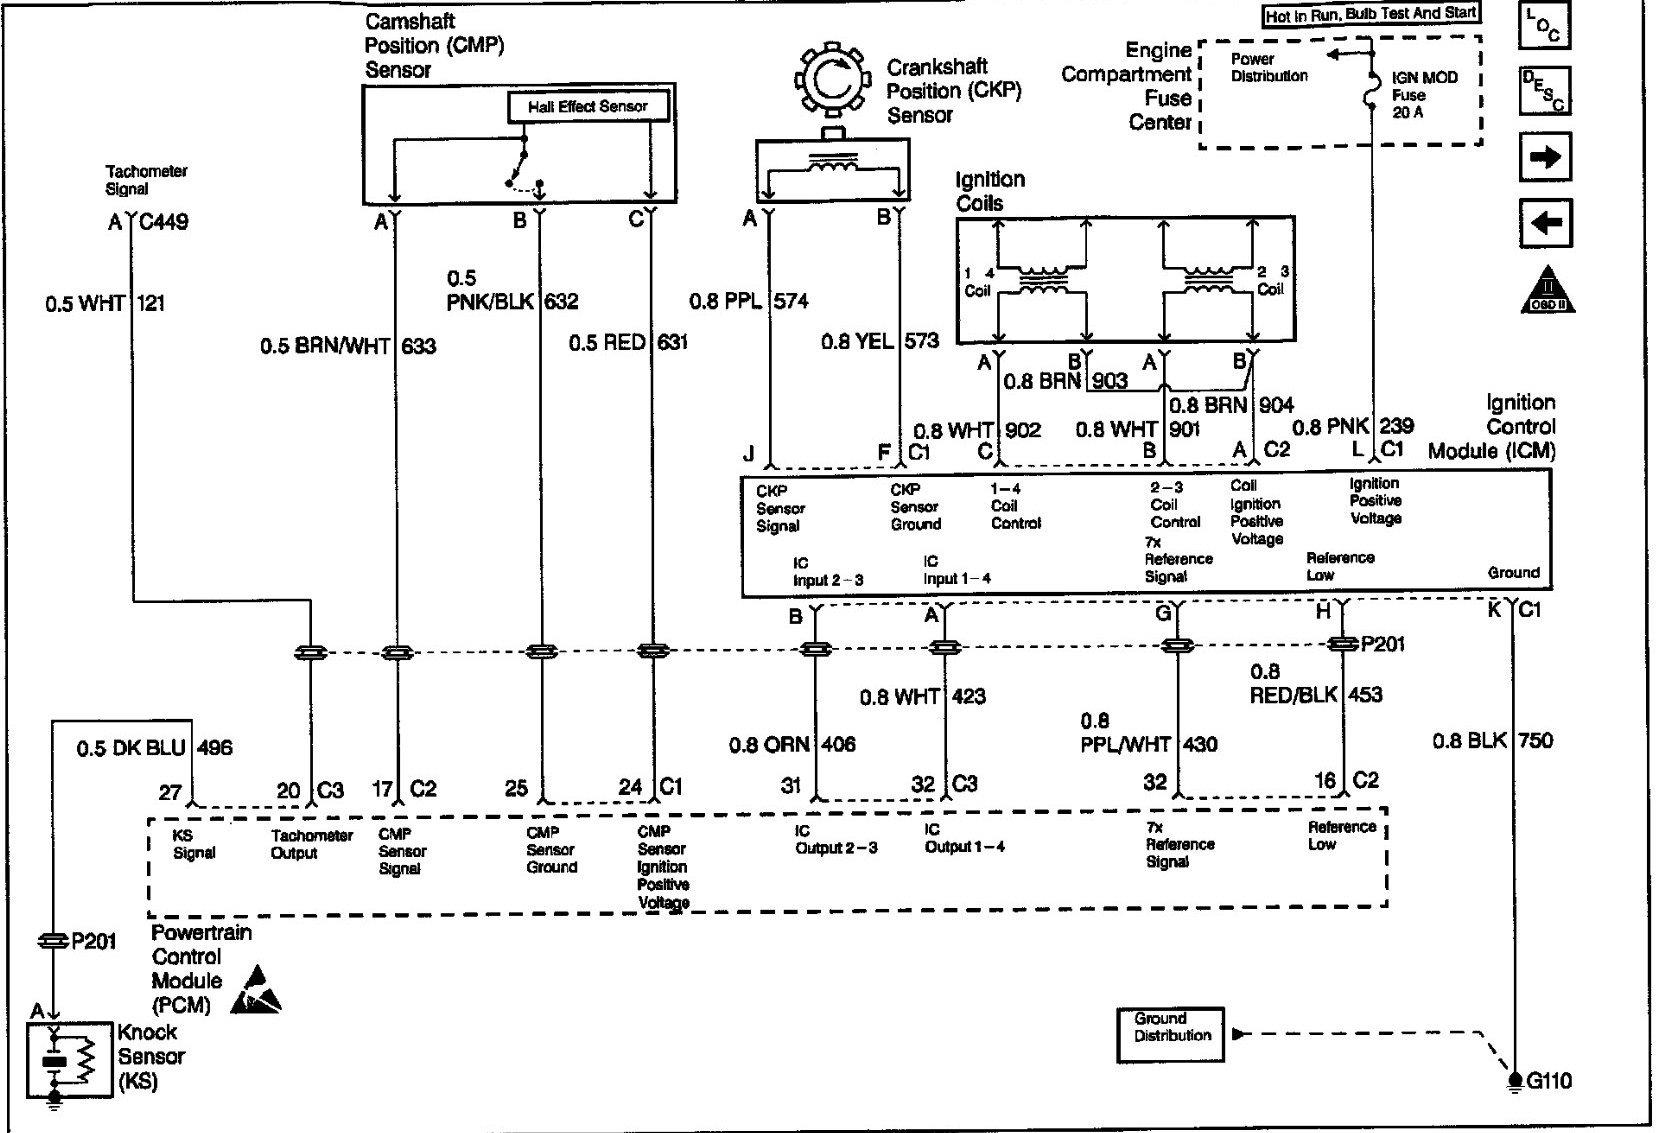 For A 1996 Pontiac Grand Am Se Engine Wiring Diagram FULL HD Version Wiring  Diagram - CAUSAL-LOOP-DIAGRAM.EMBALLAGES-SOUS-VIDE.FR Diagram Database - EMBALLAGES-SOUS-VIDE.FR